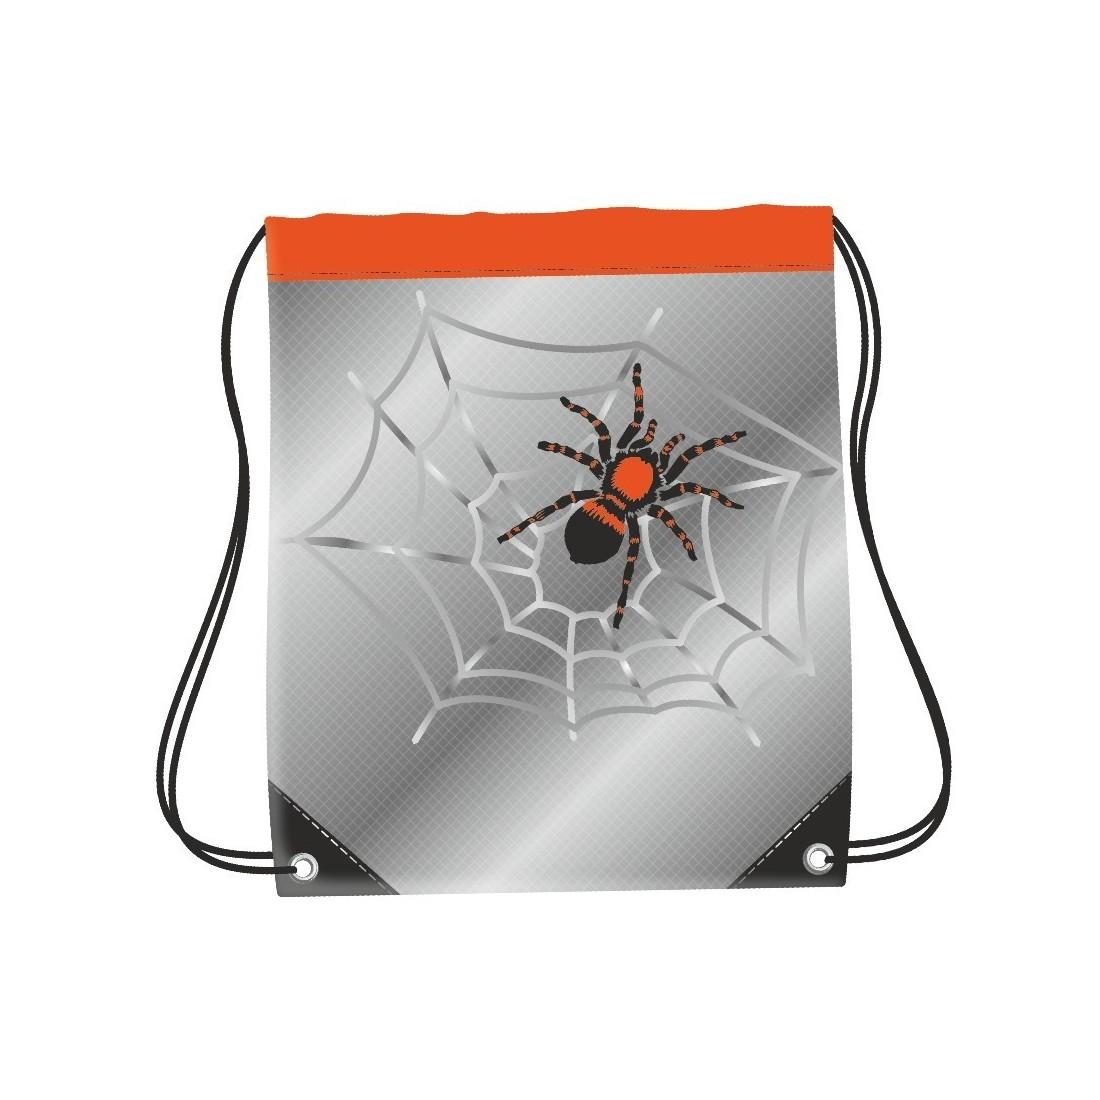 WOREK NA BUTY COOLPACK CP SPIDER SZARY Z PAJĄKIEM - plecak-tornister.pl